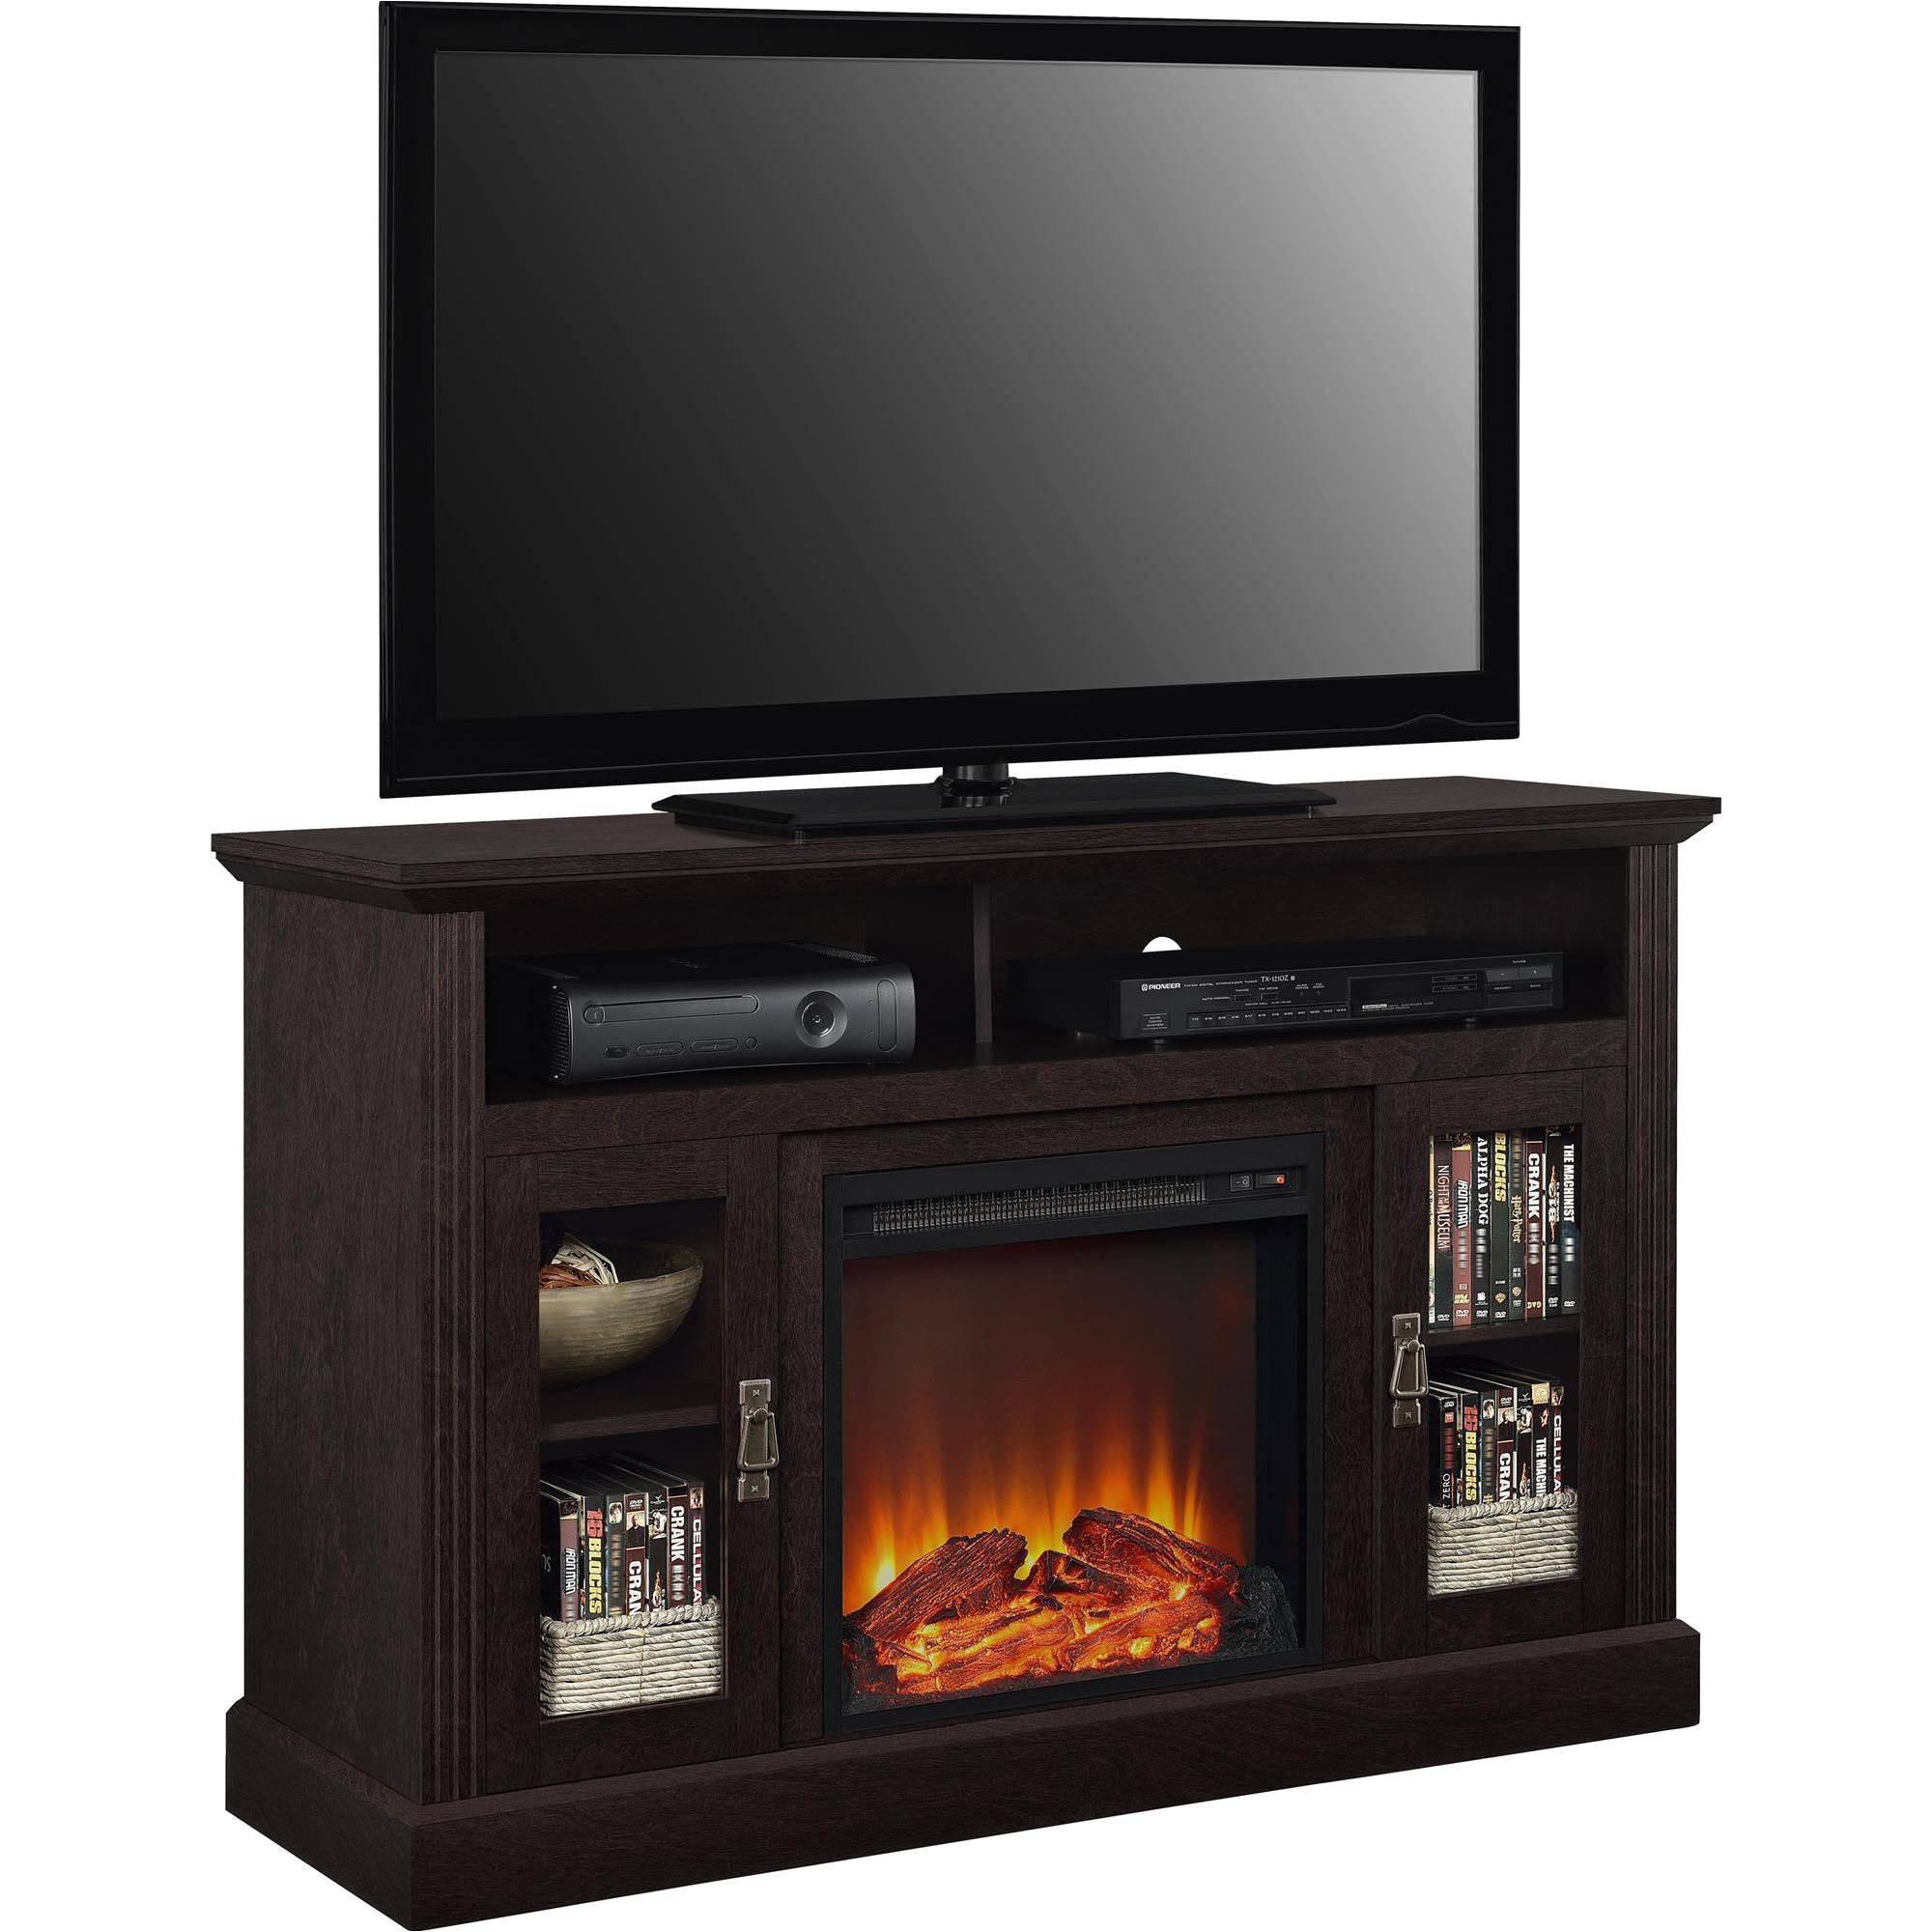 Fireplaces at Walmart Whalen Fireplace Media Console Walmart Luxury Best Walmart Outdoor